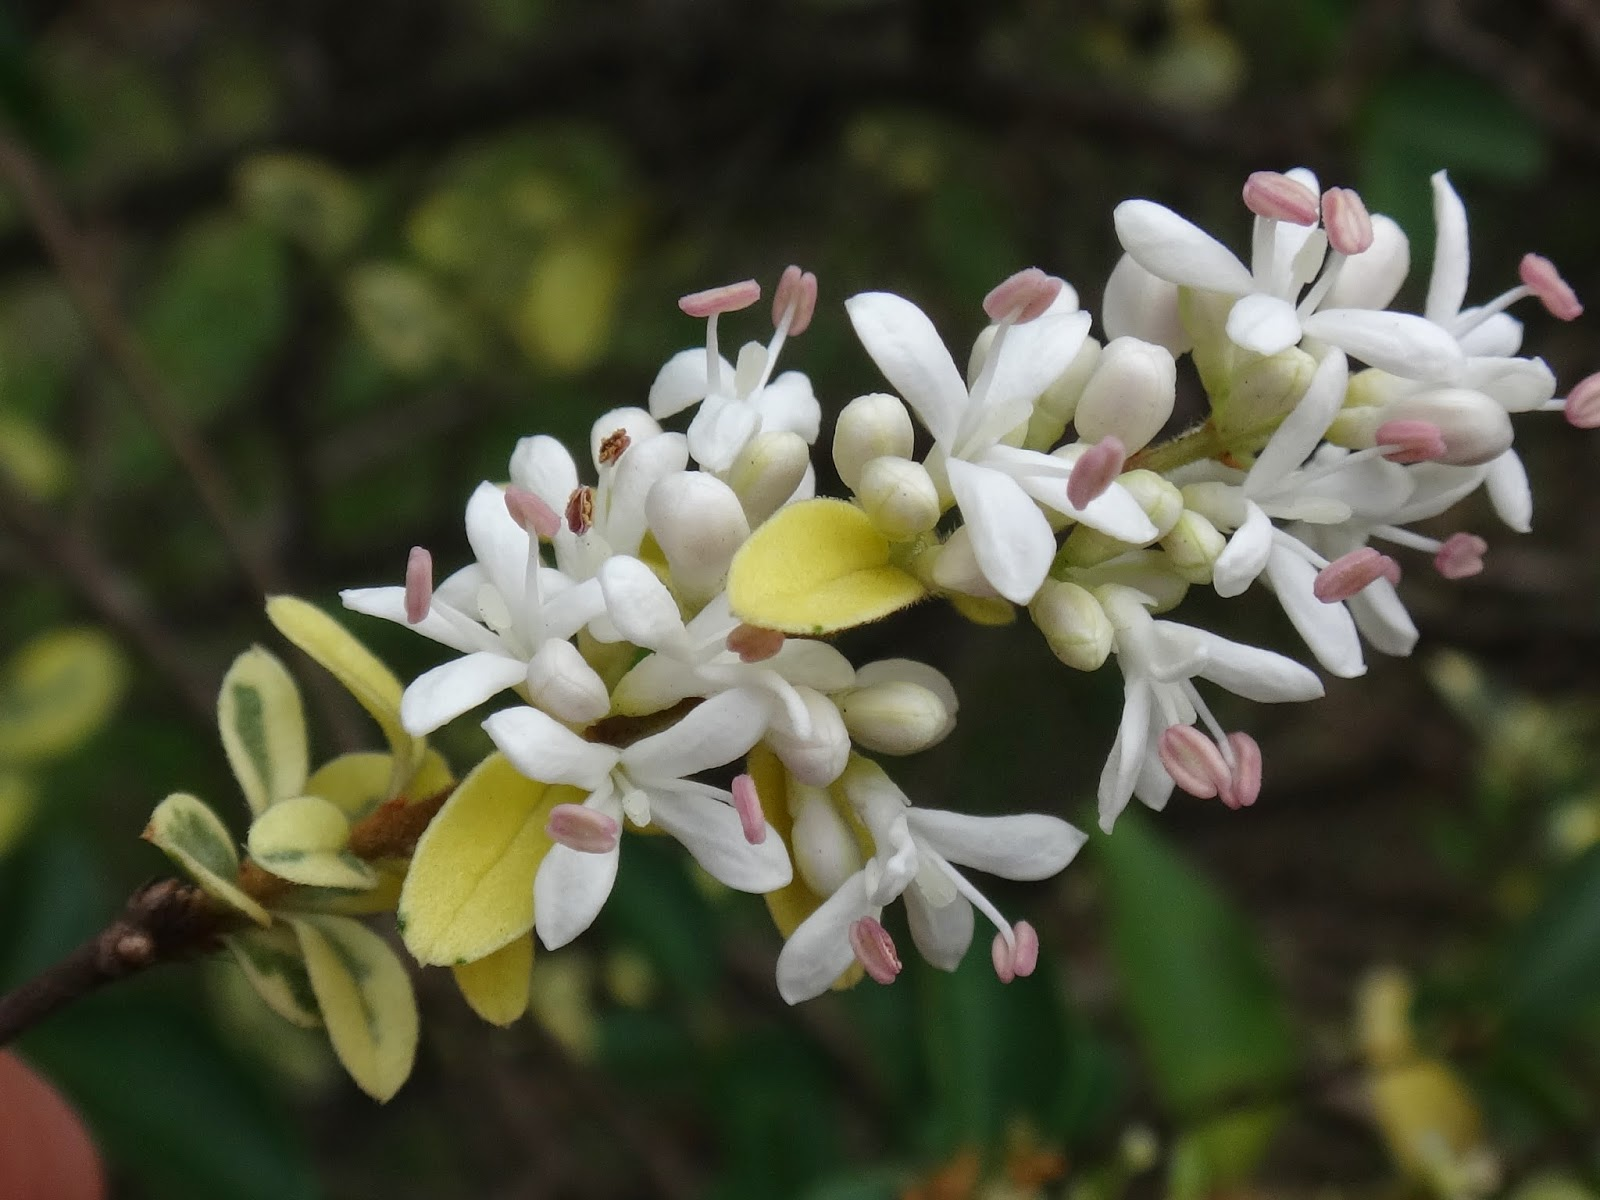 flores do ligustro variegata (27)